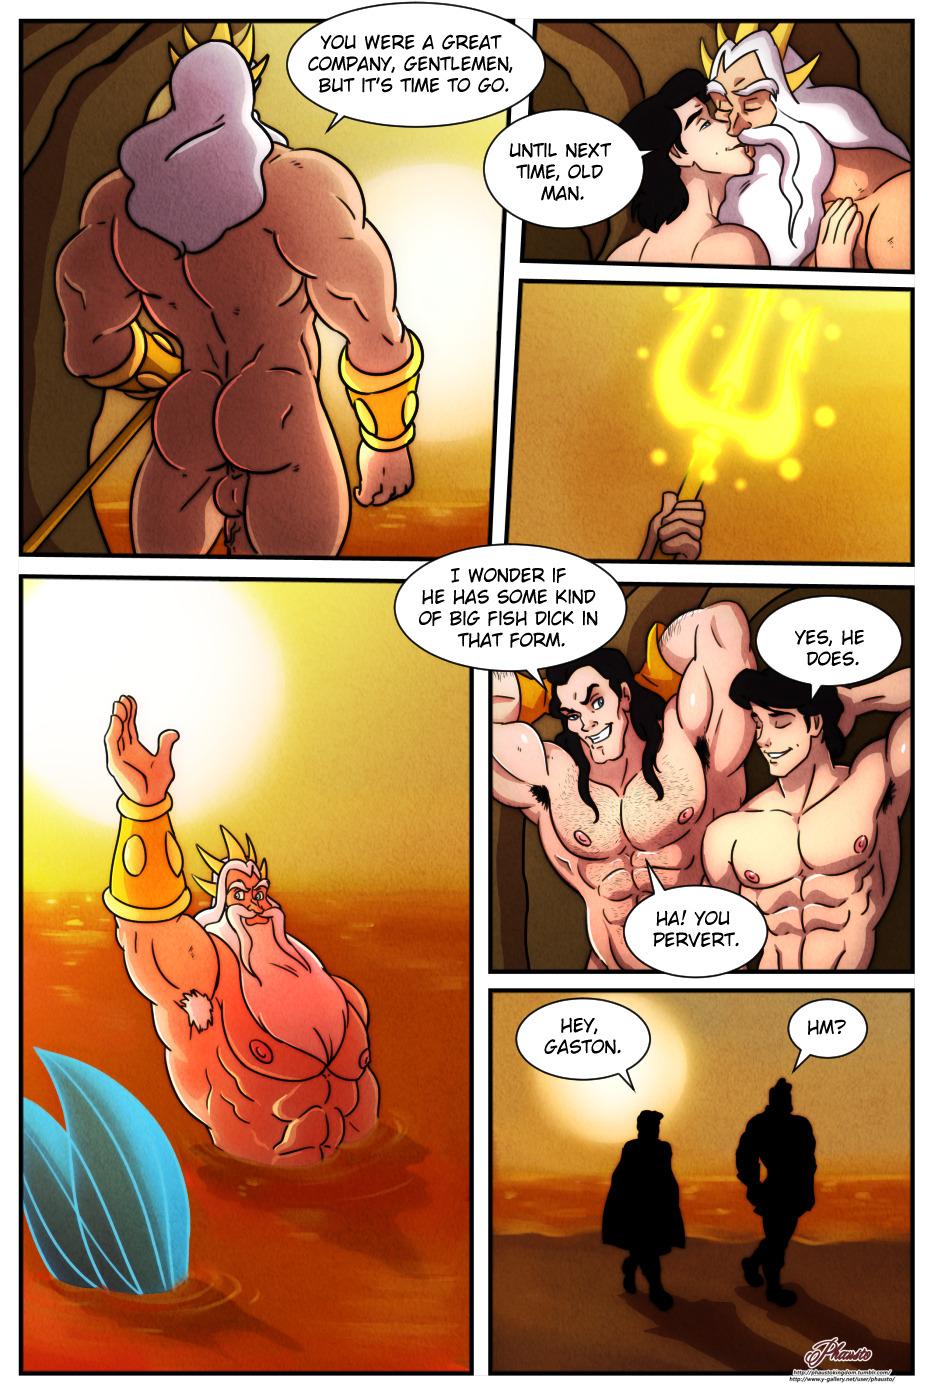 does god accept gays